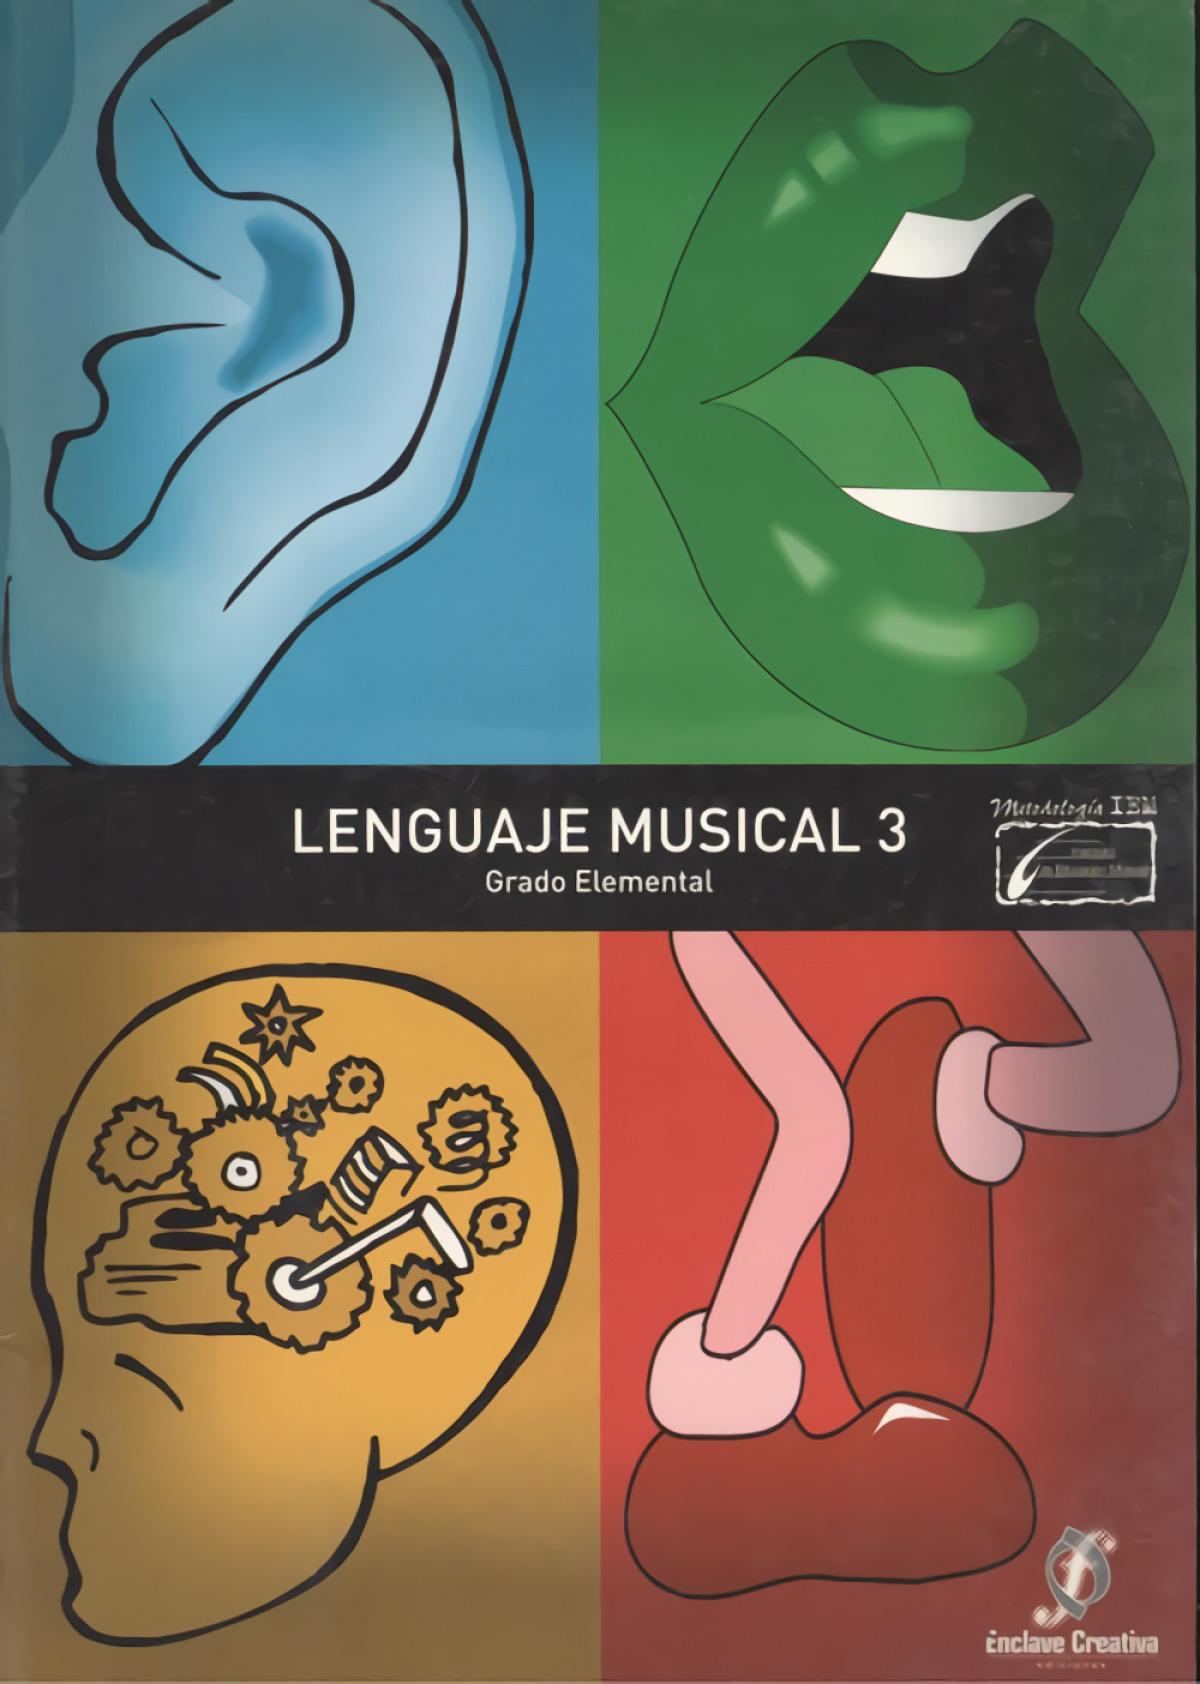 LENGUAJE MUSICAL 3 (GRADO ELEMENTAL)